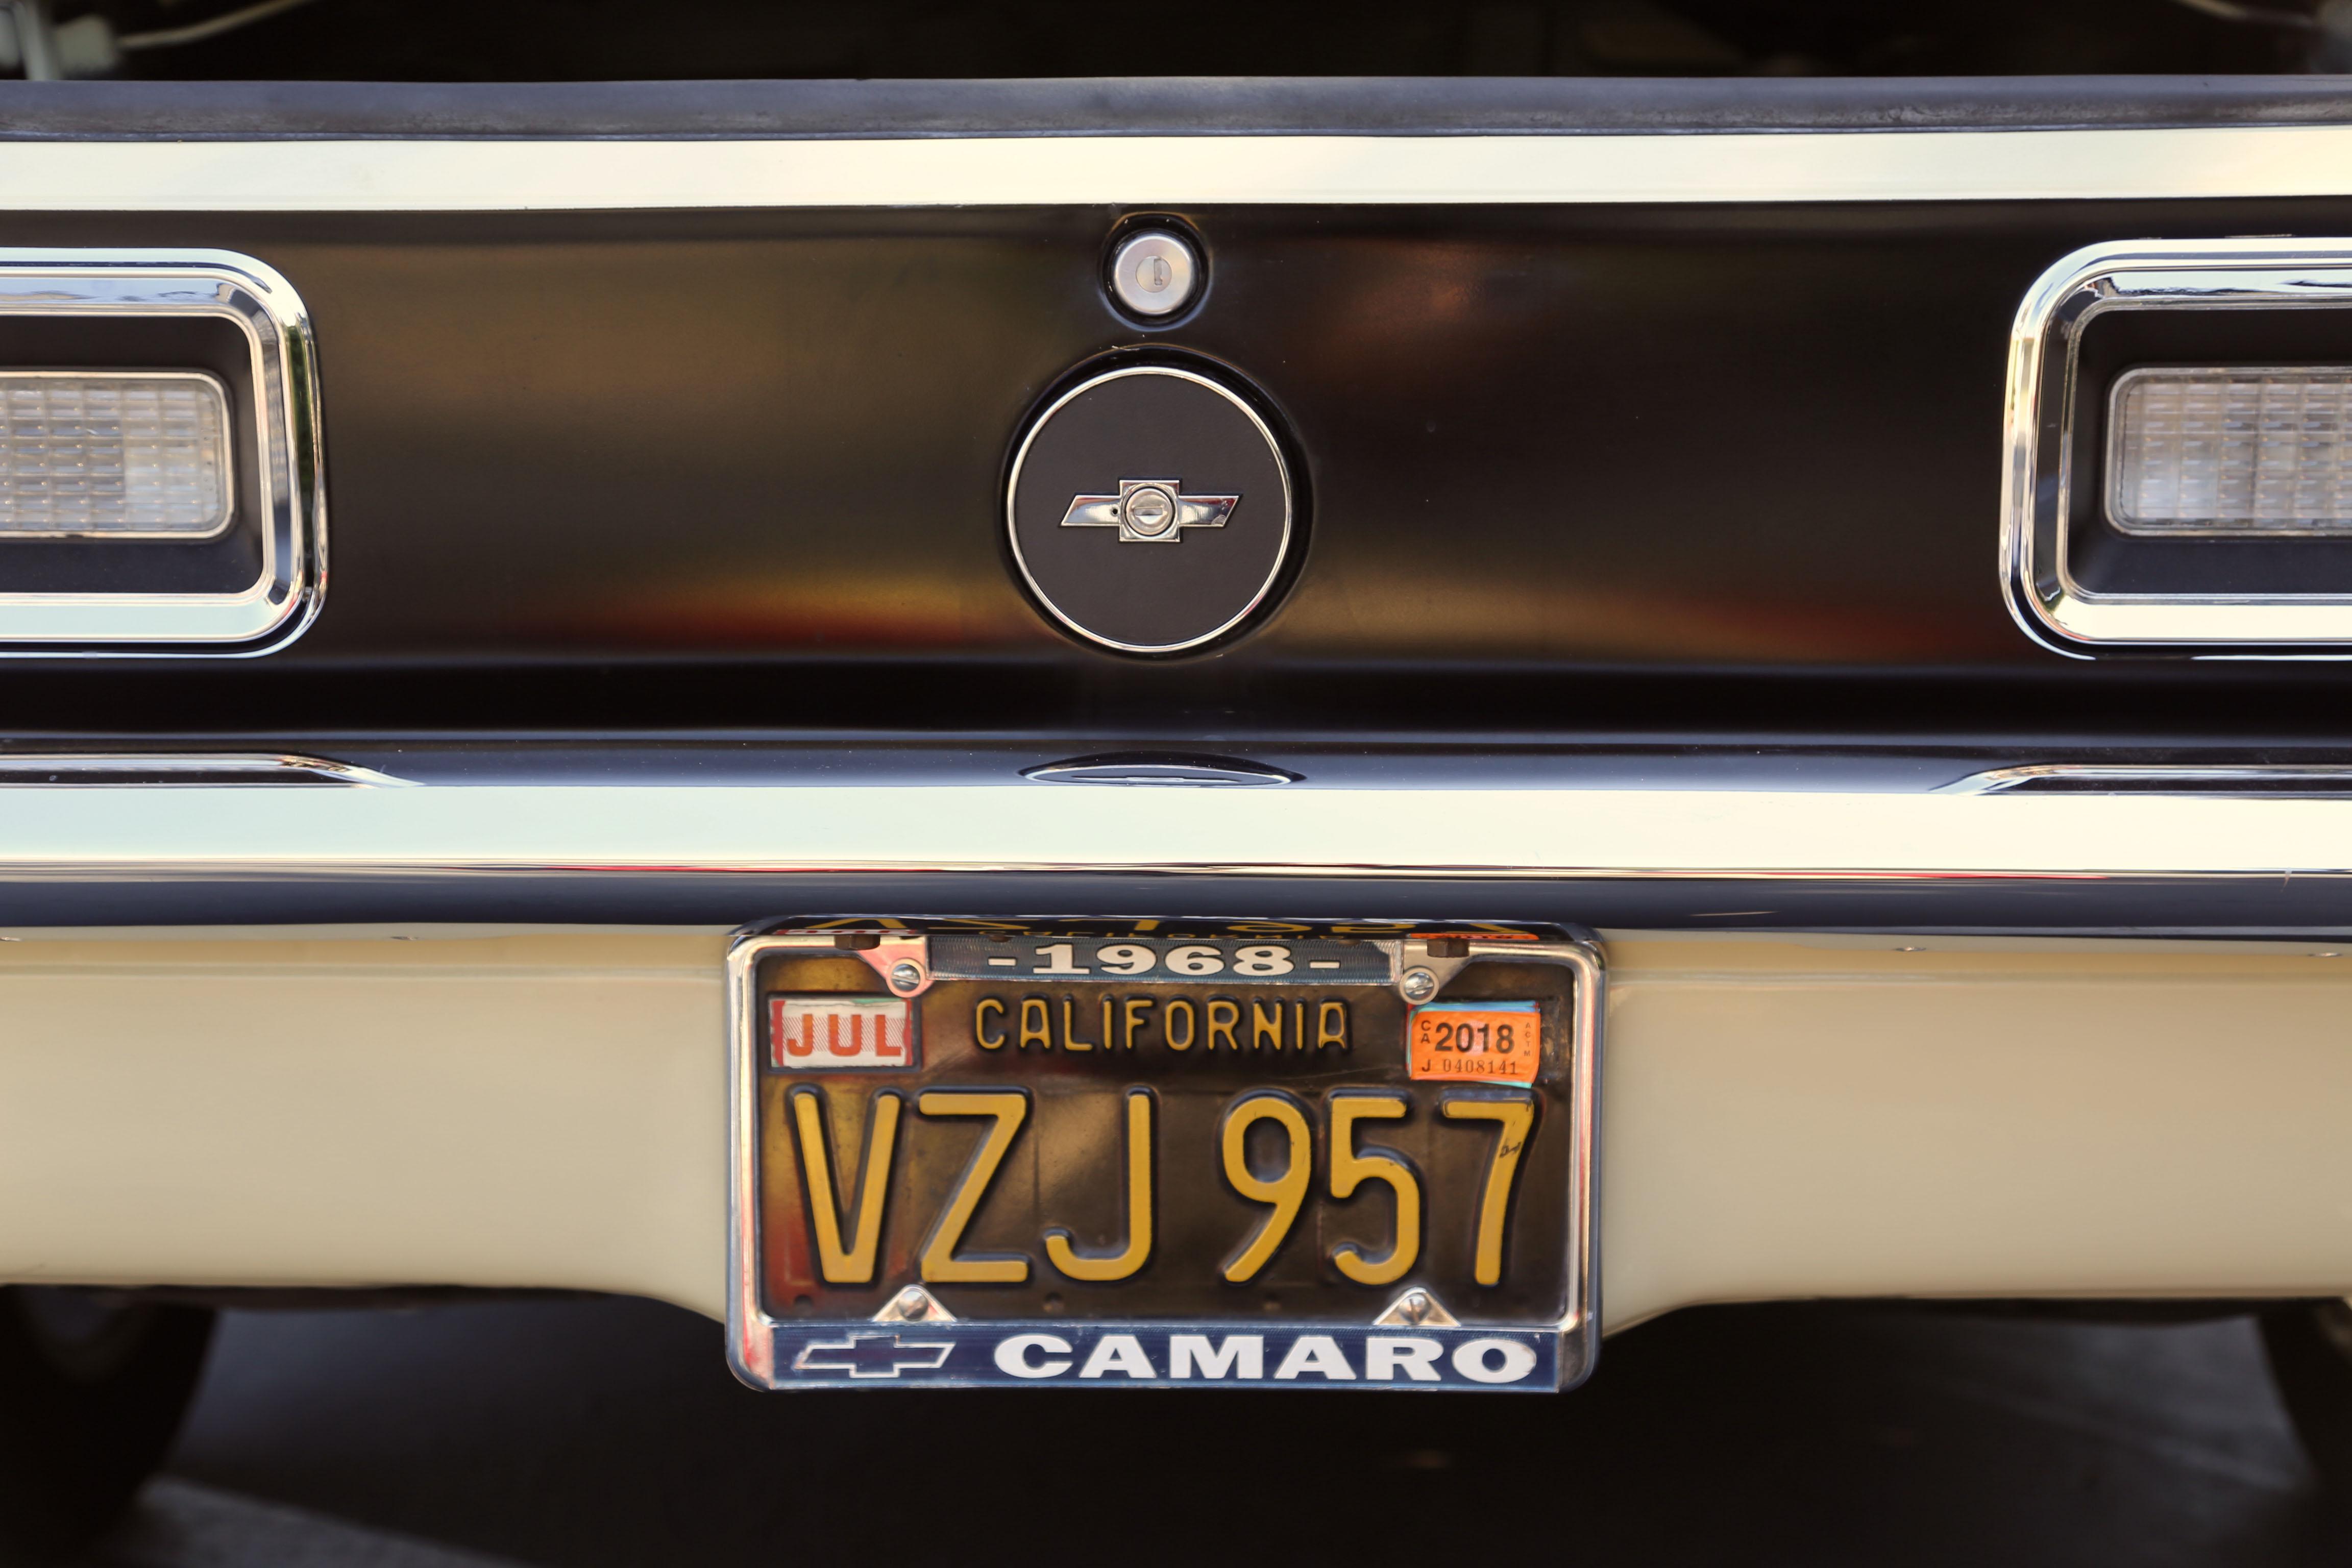 1968 Camaro Odd Options black out panel